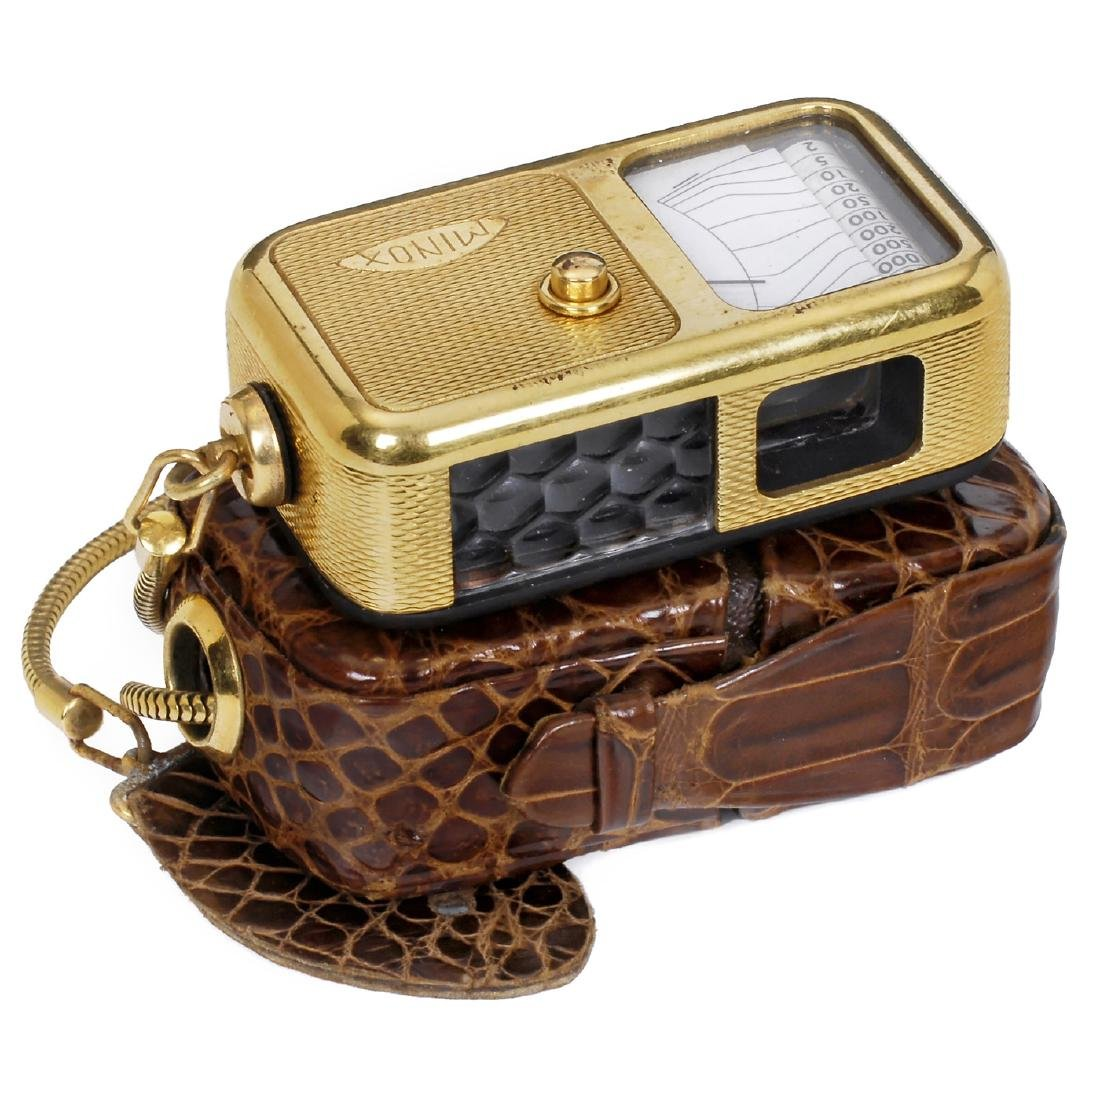 "Minox A ""Gold"" Lightmeter, c. 1948"